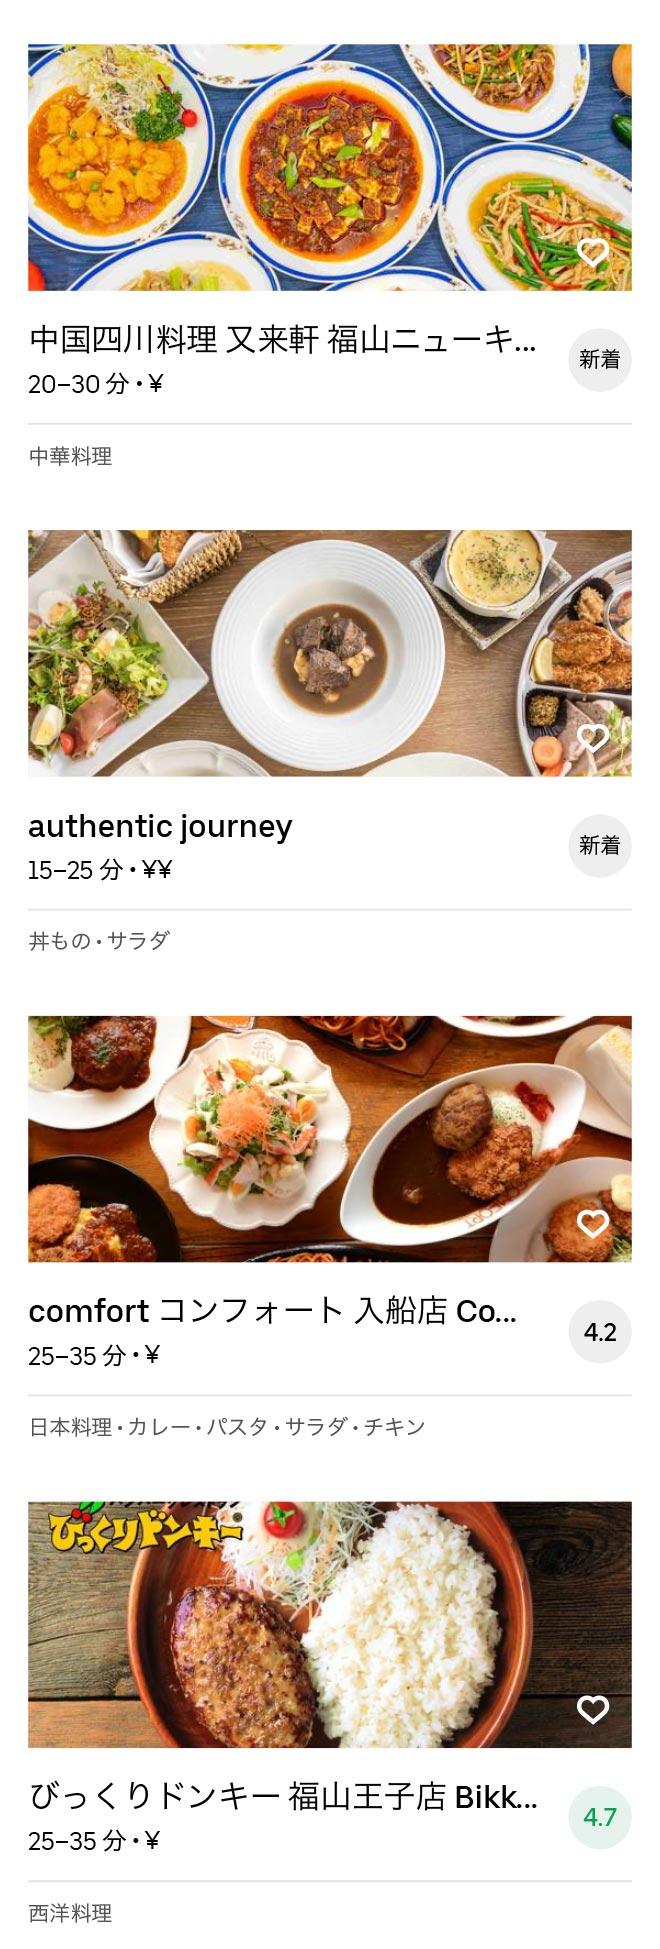 Fukuyama menu 2010 08